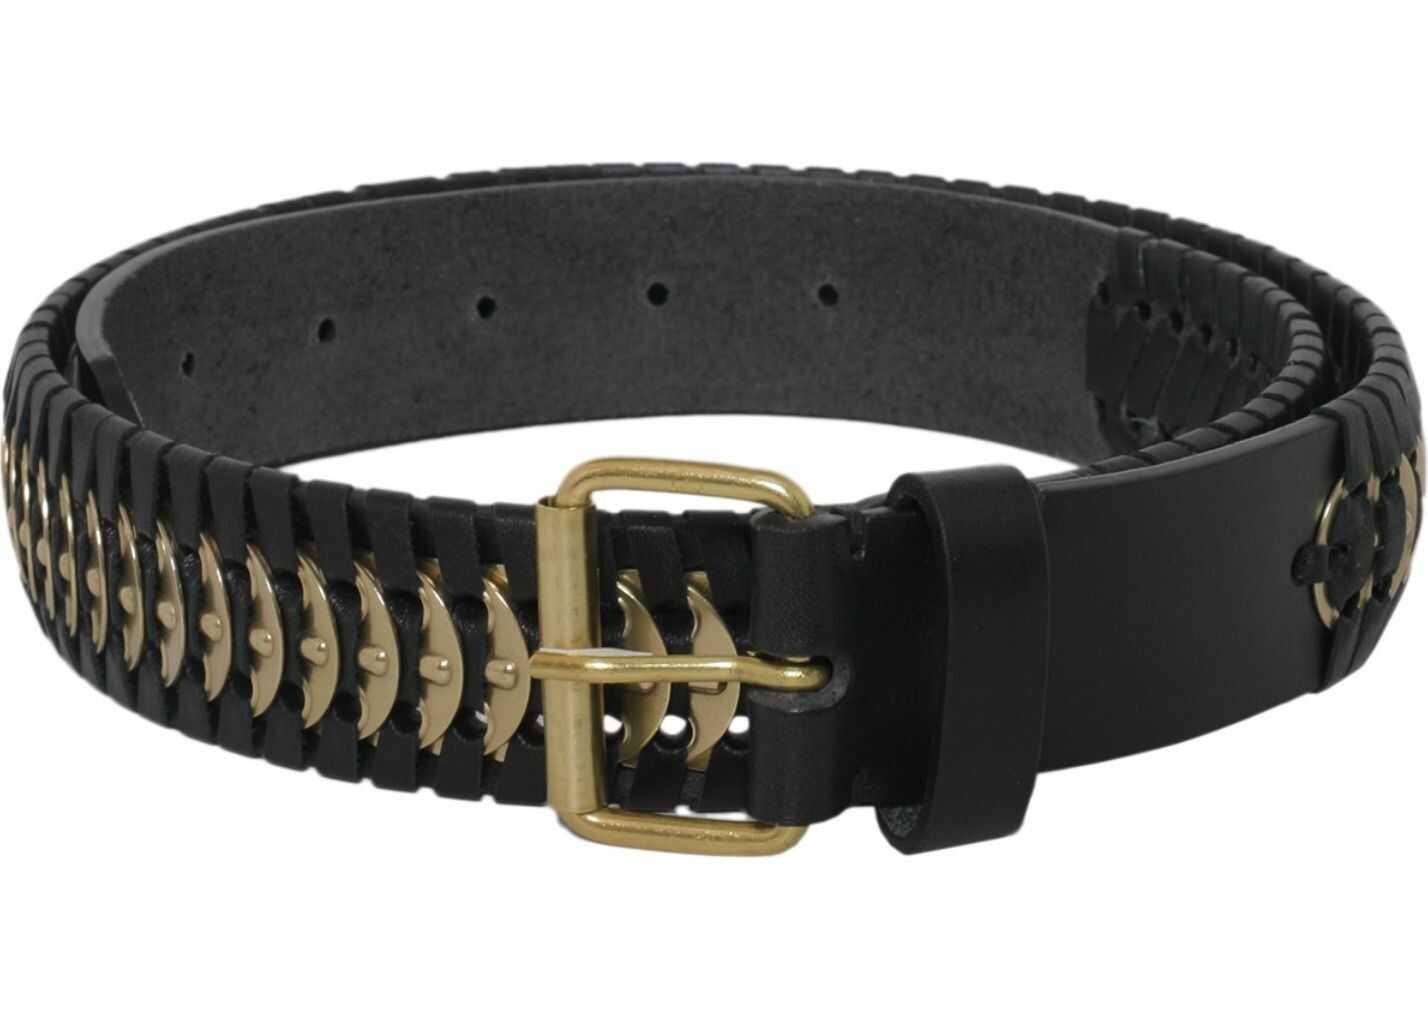 Samurai Belt